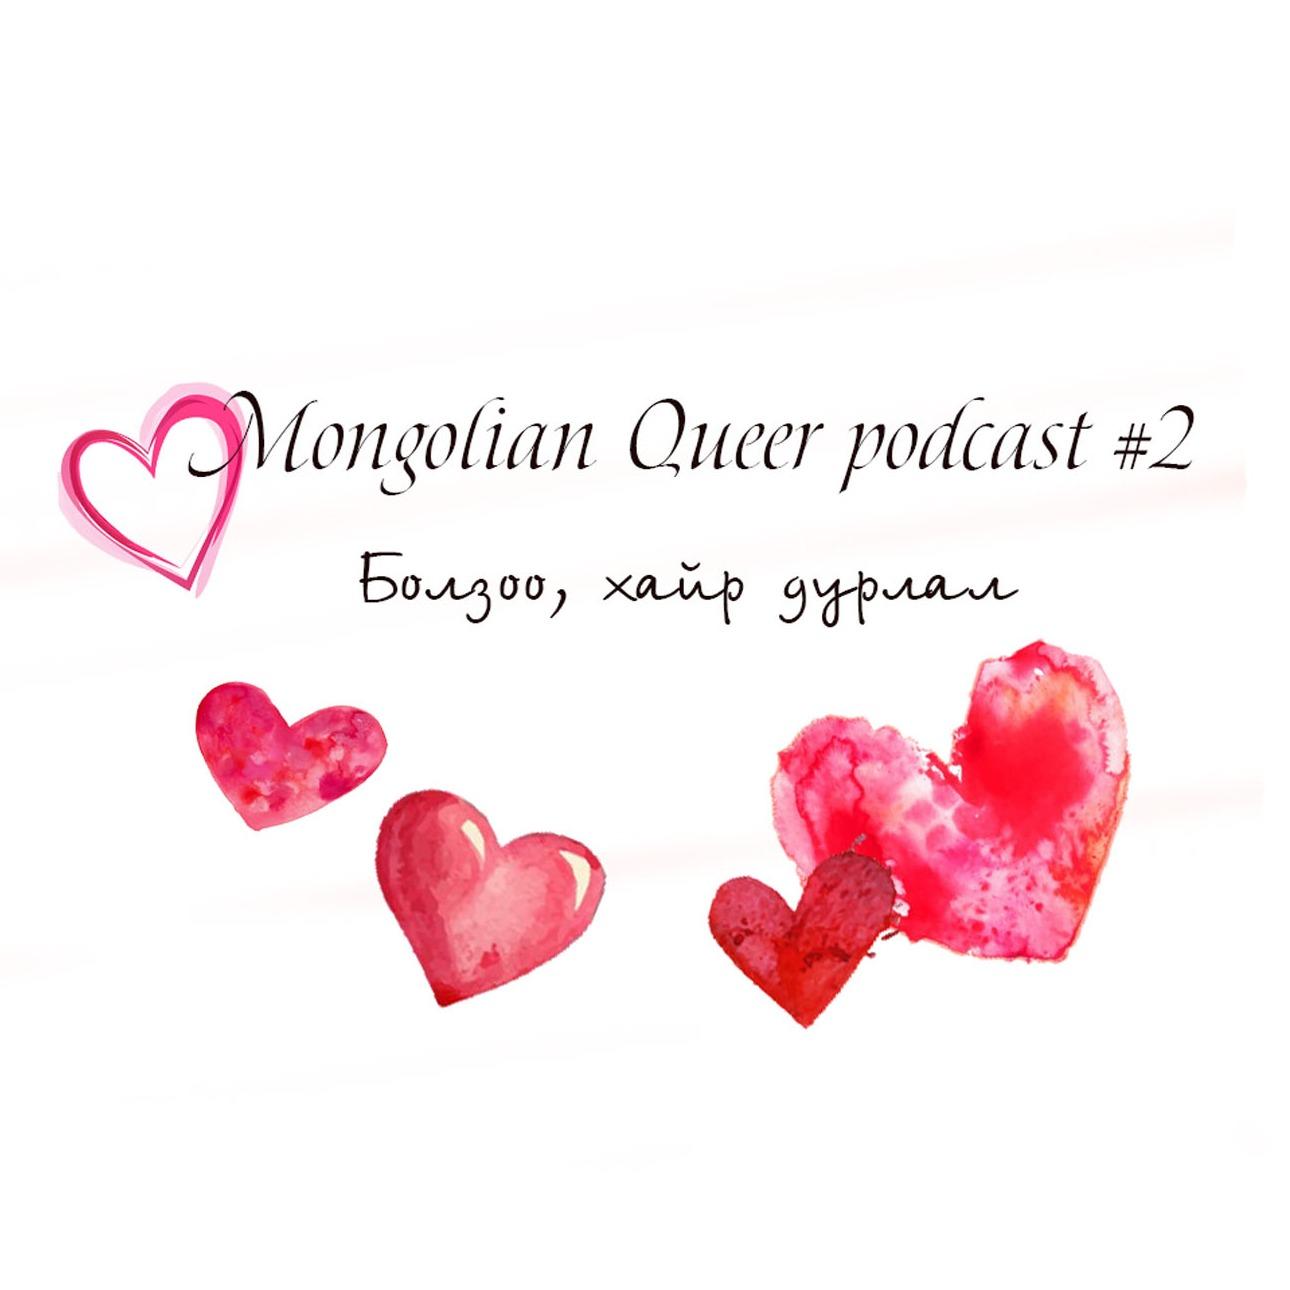 Mongolian Queer podcast #2: Болзоо, хайр дурлал